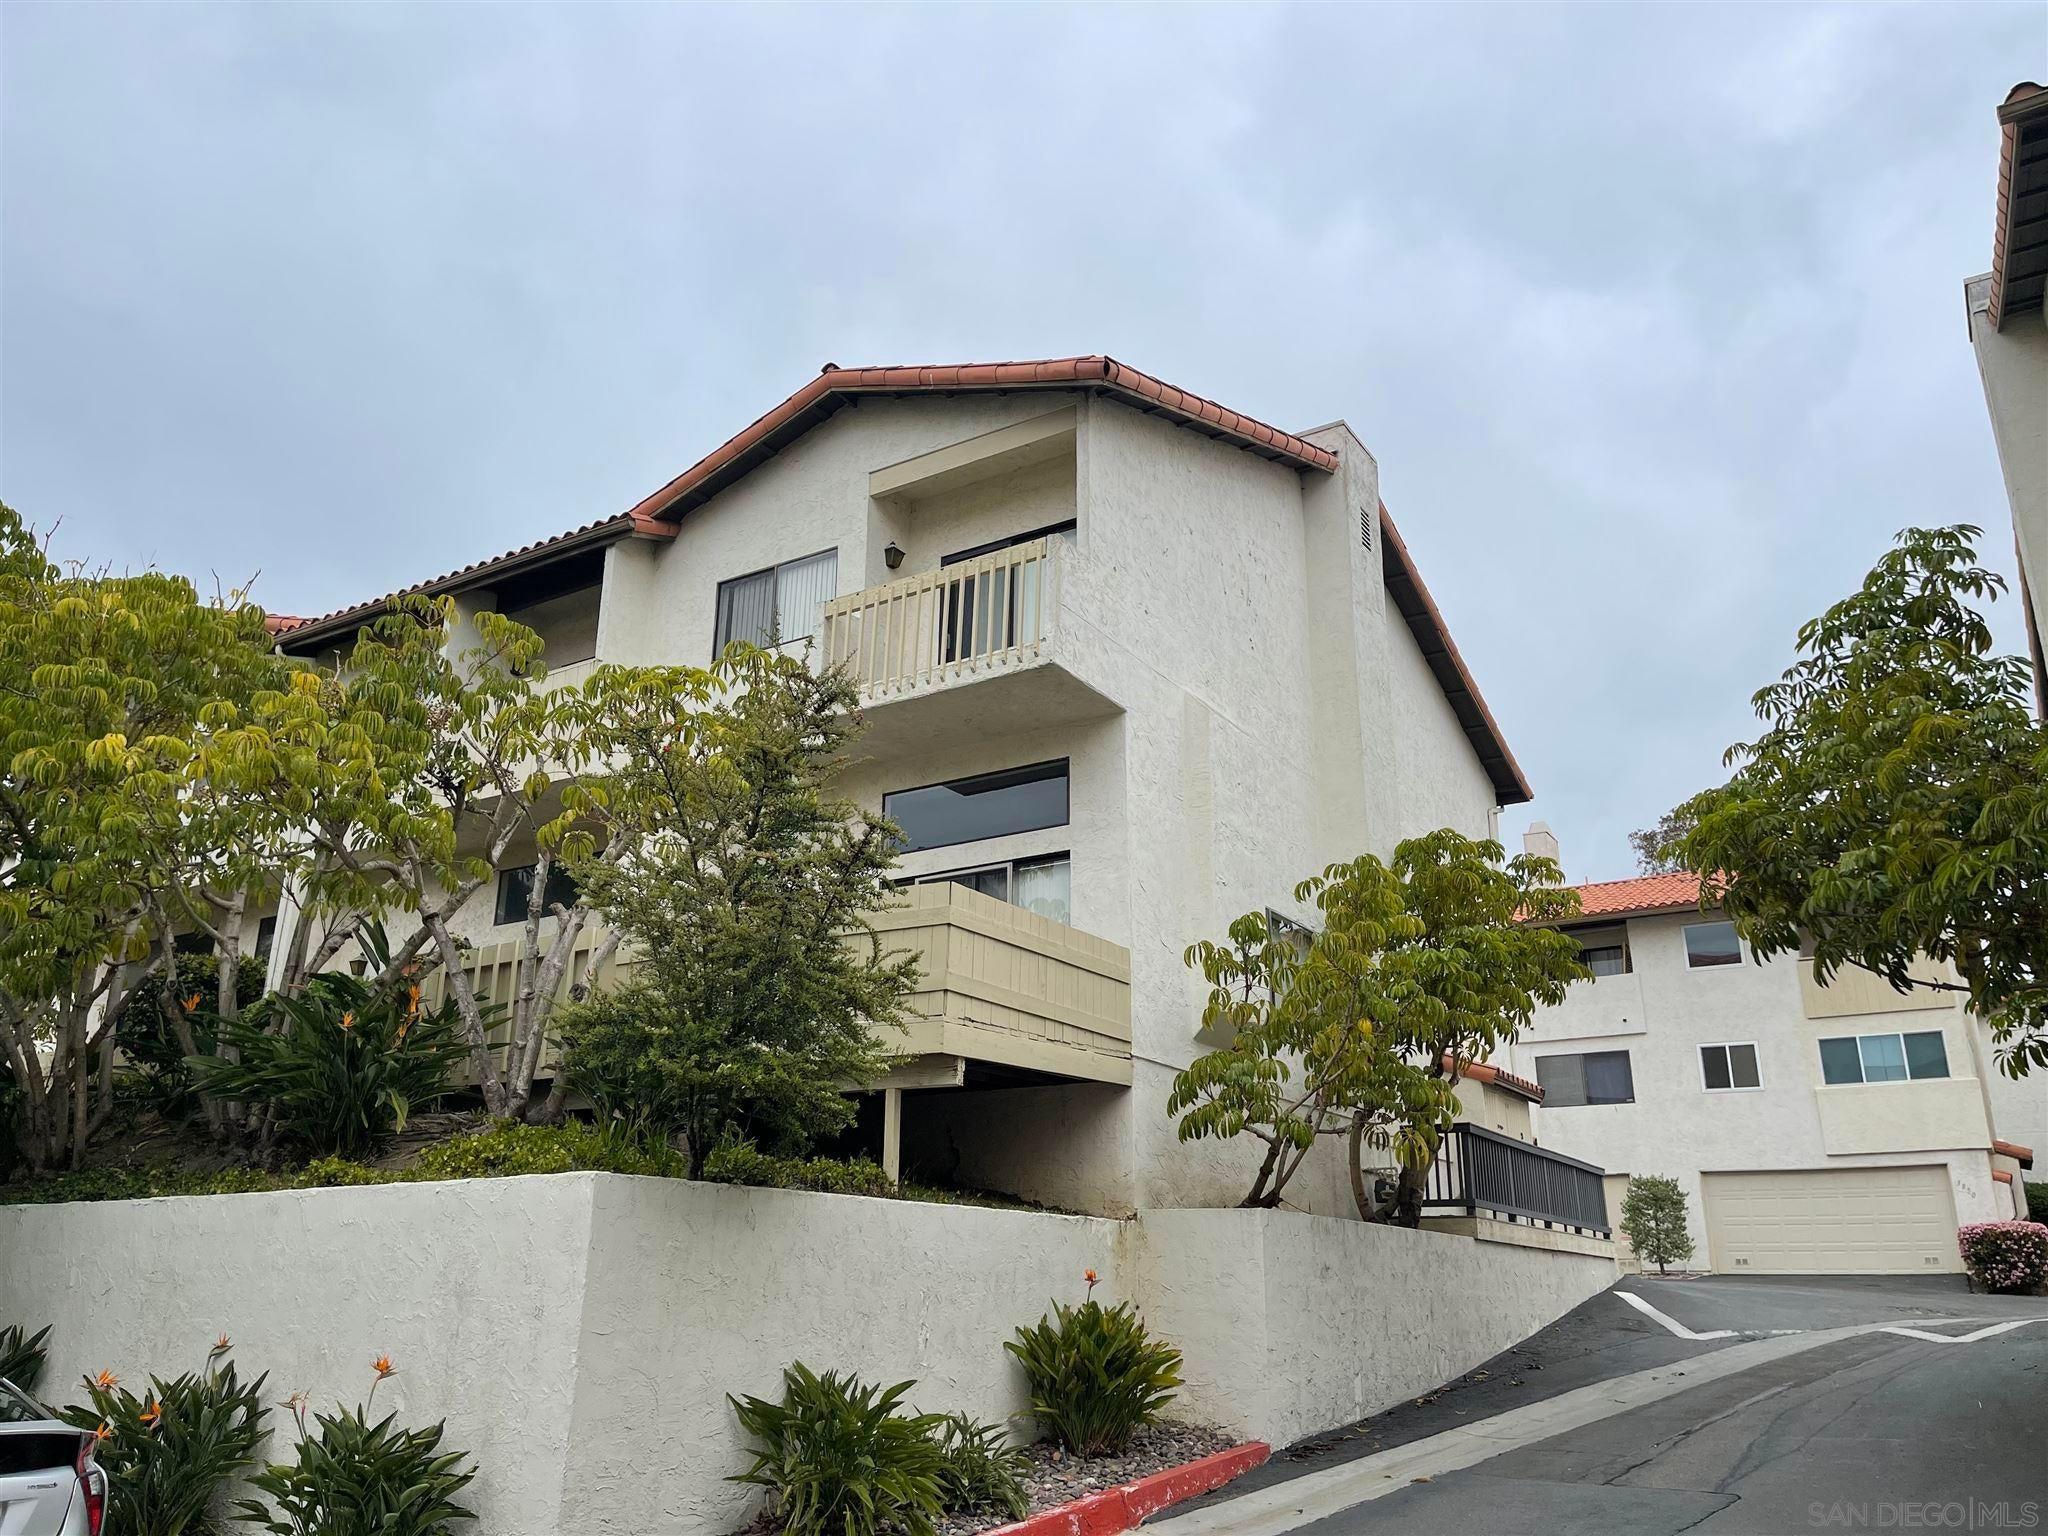 3830 La Jolla Village Dr., LA JOLLA